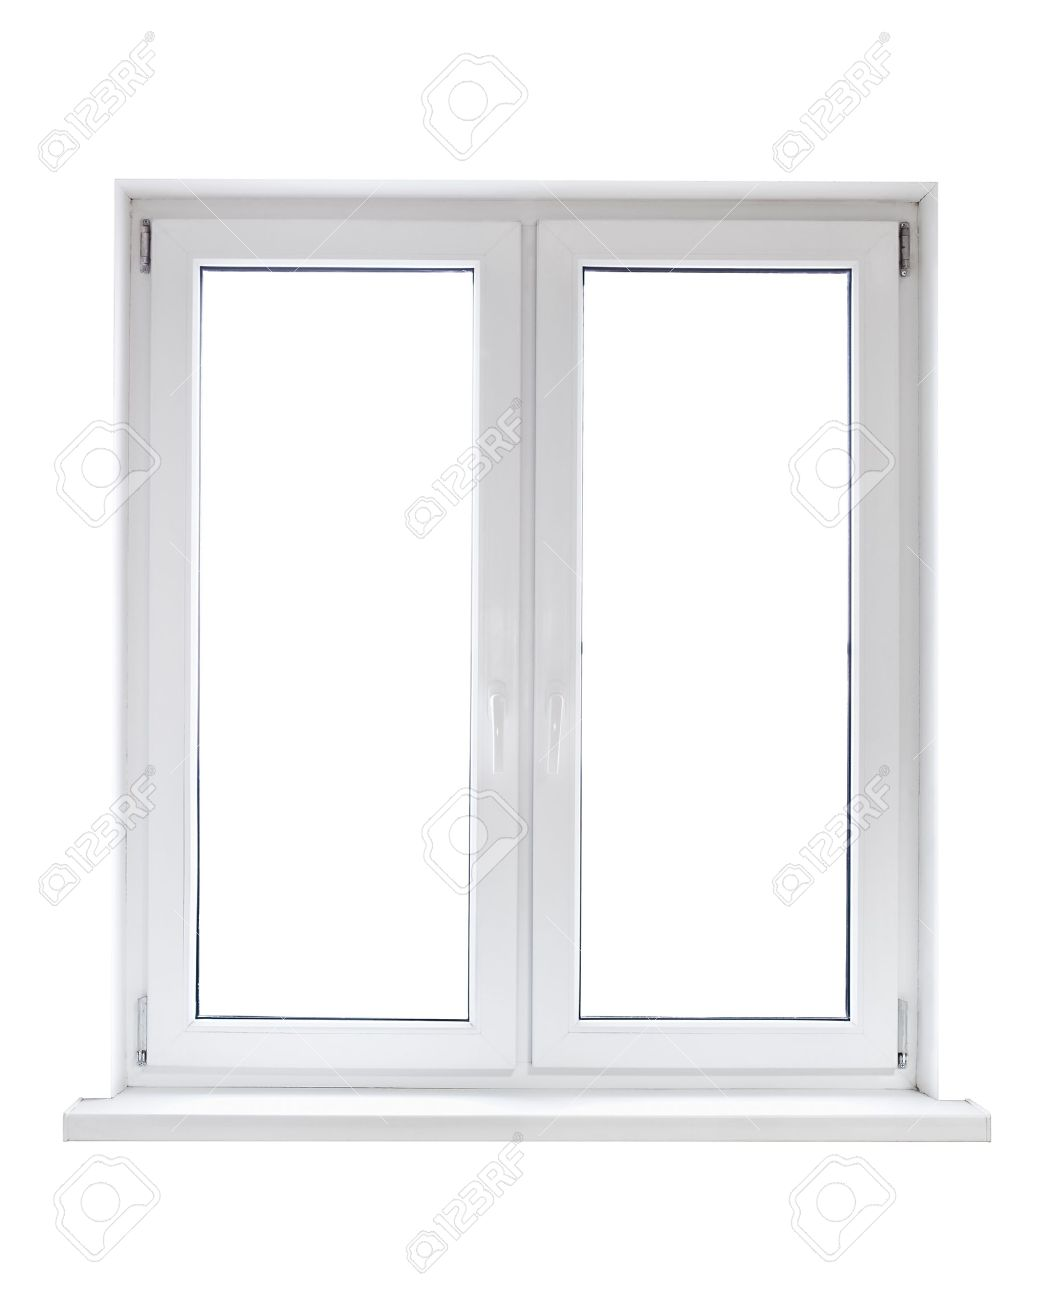 White Plastic Double Door Window Isolated On White Background Stock ...